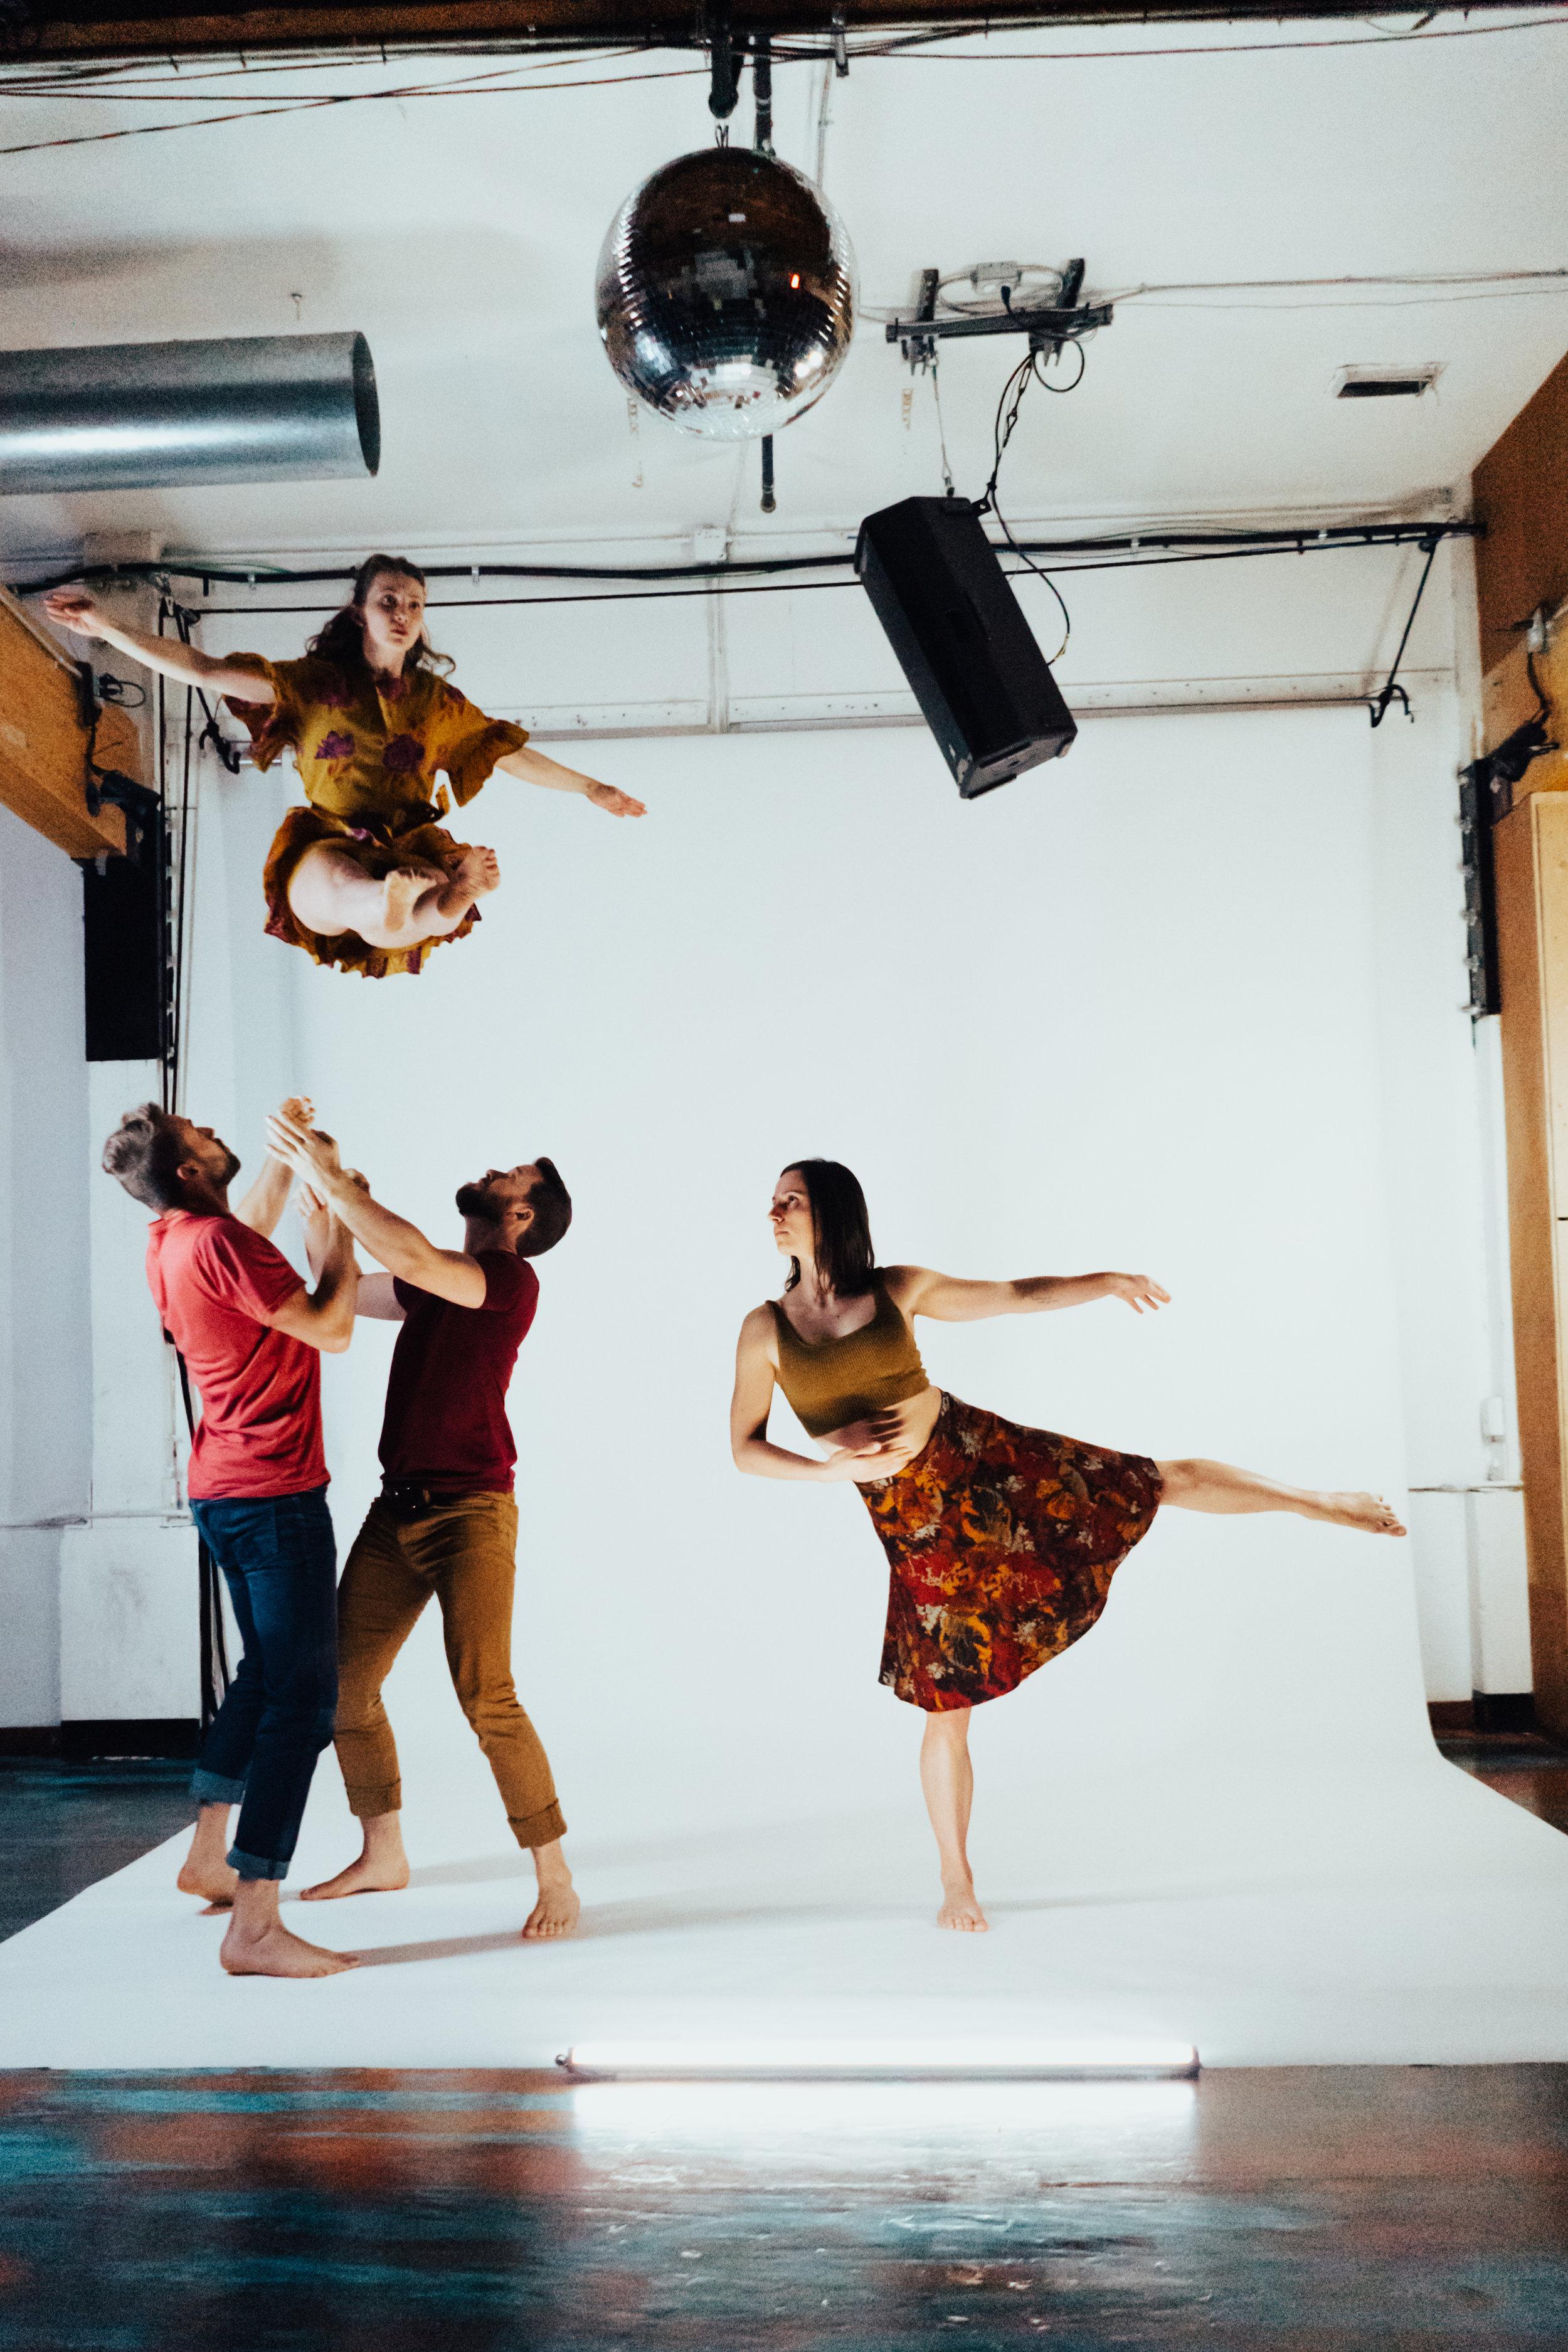 The human condition   Carissa Joy, Megan Pratt, Mark Olsthoorn  & Daniel Latuszek